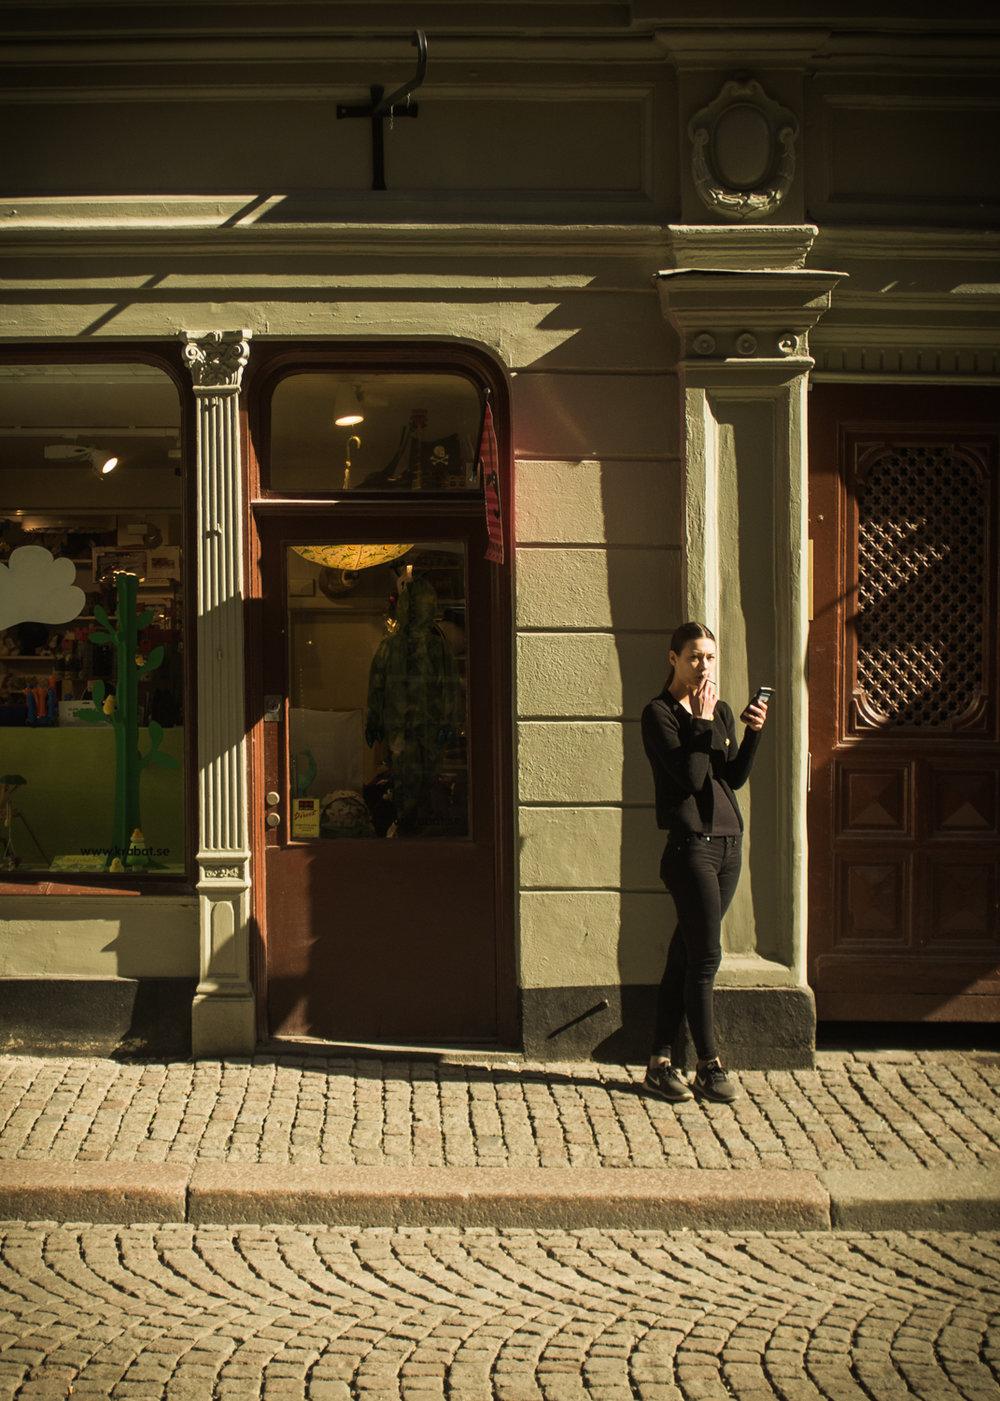 stockholm-19.jpg